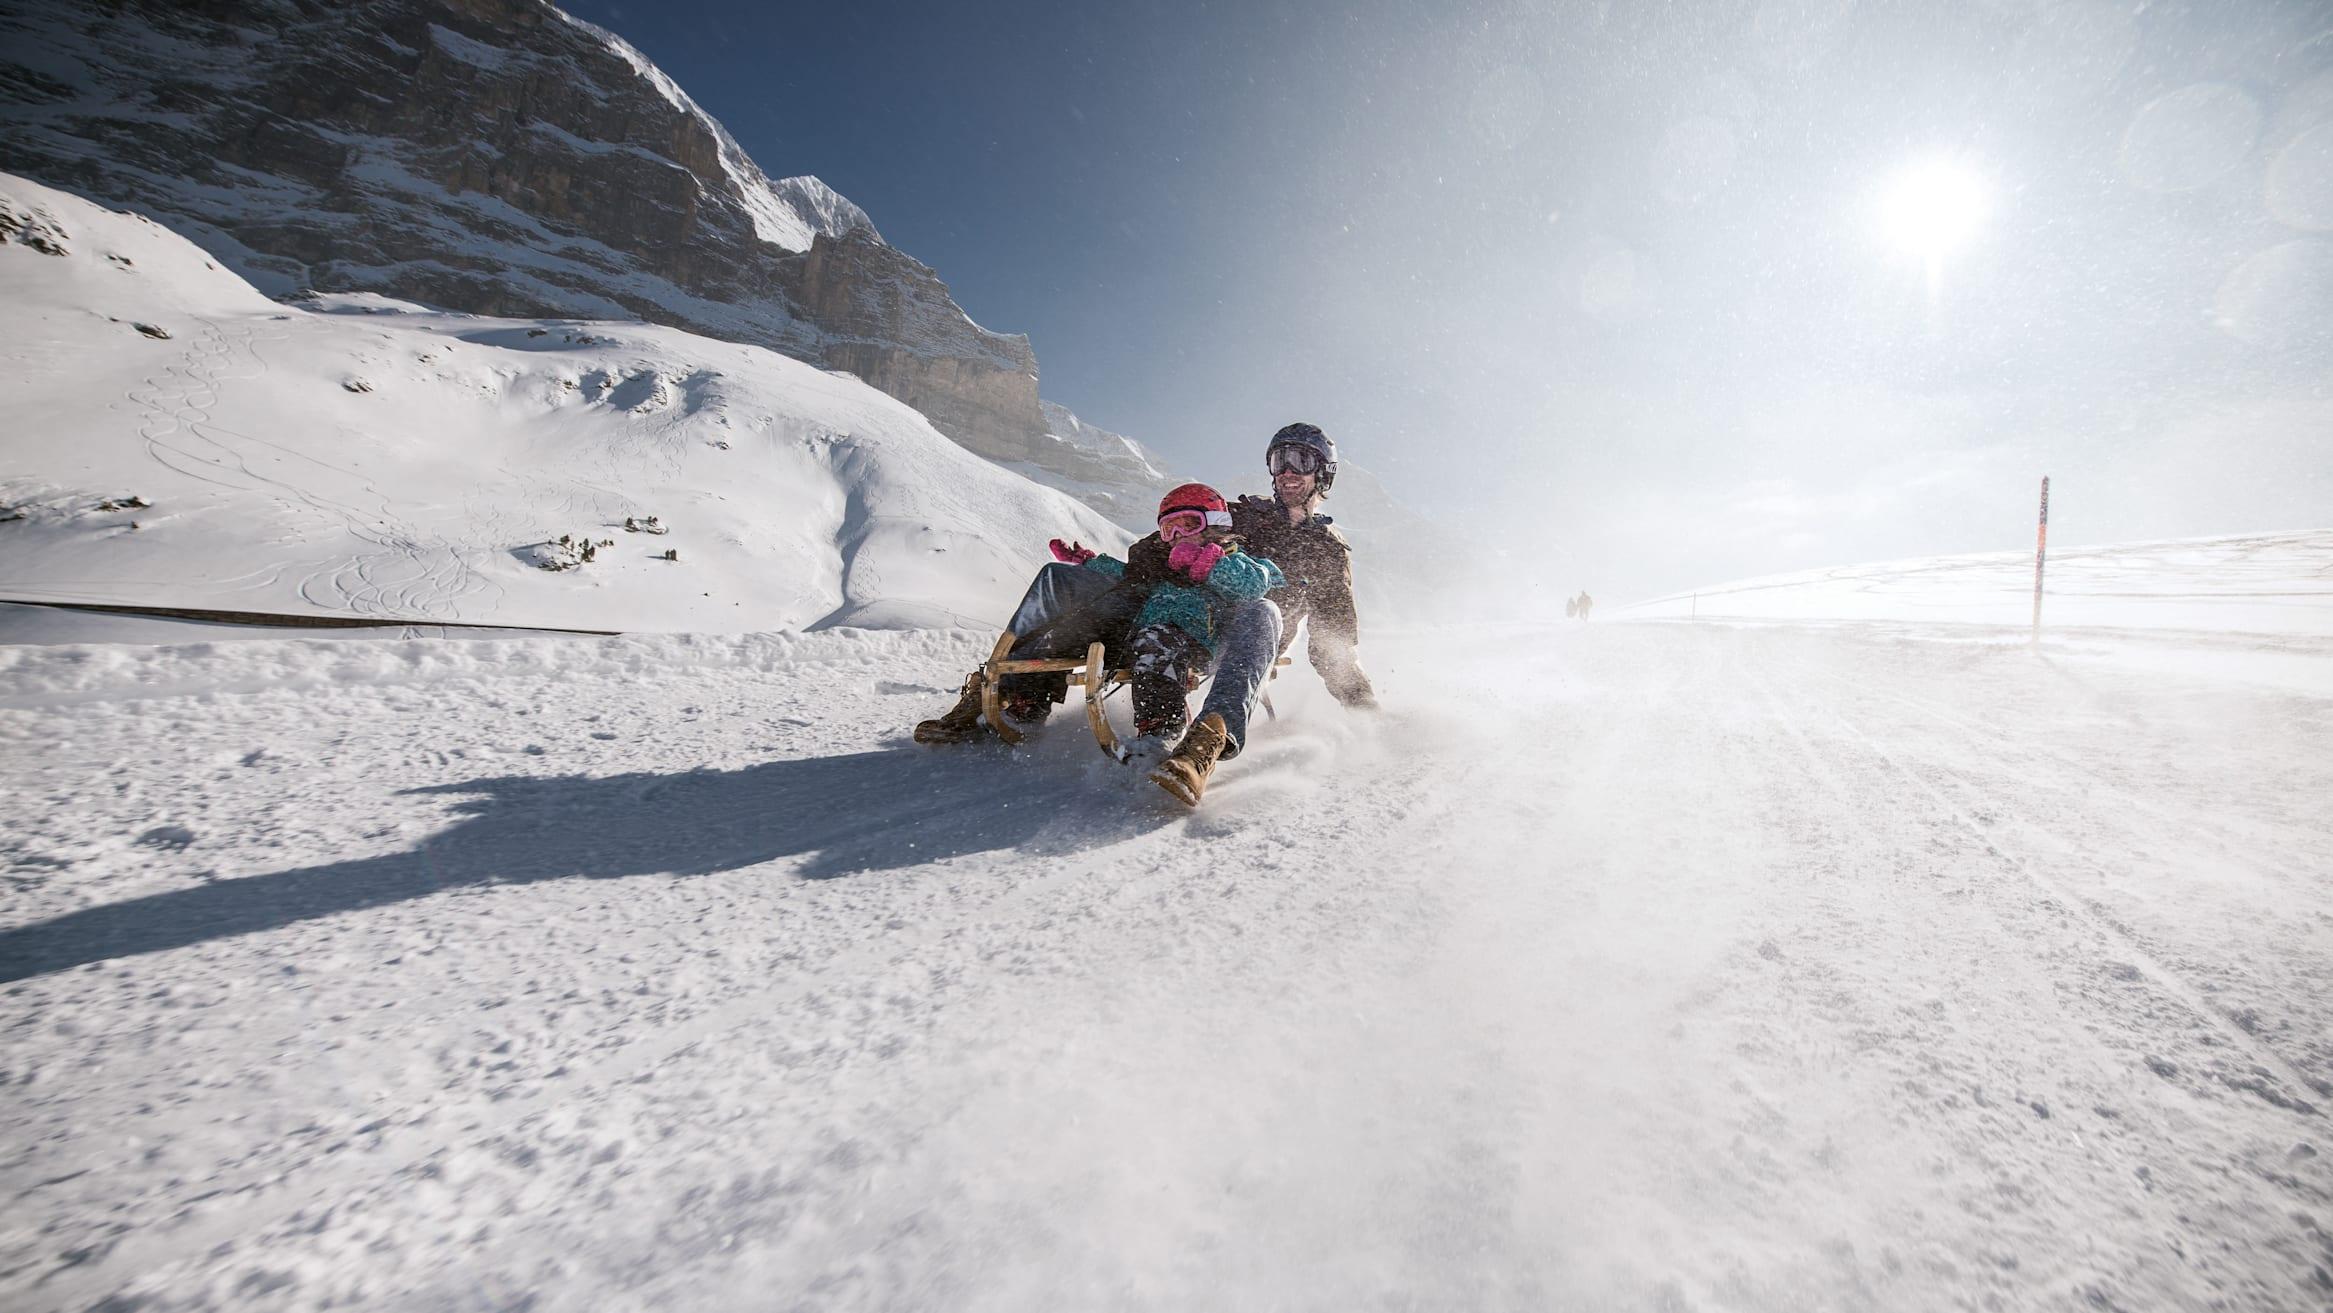 Jungfrau Grindelwald Eiger Run sledging